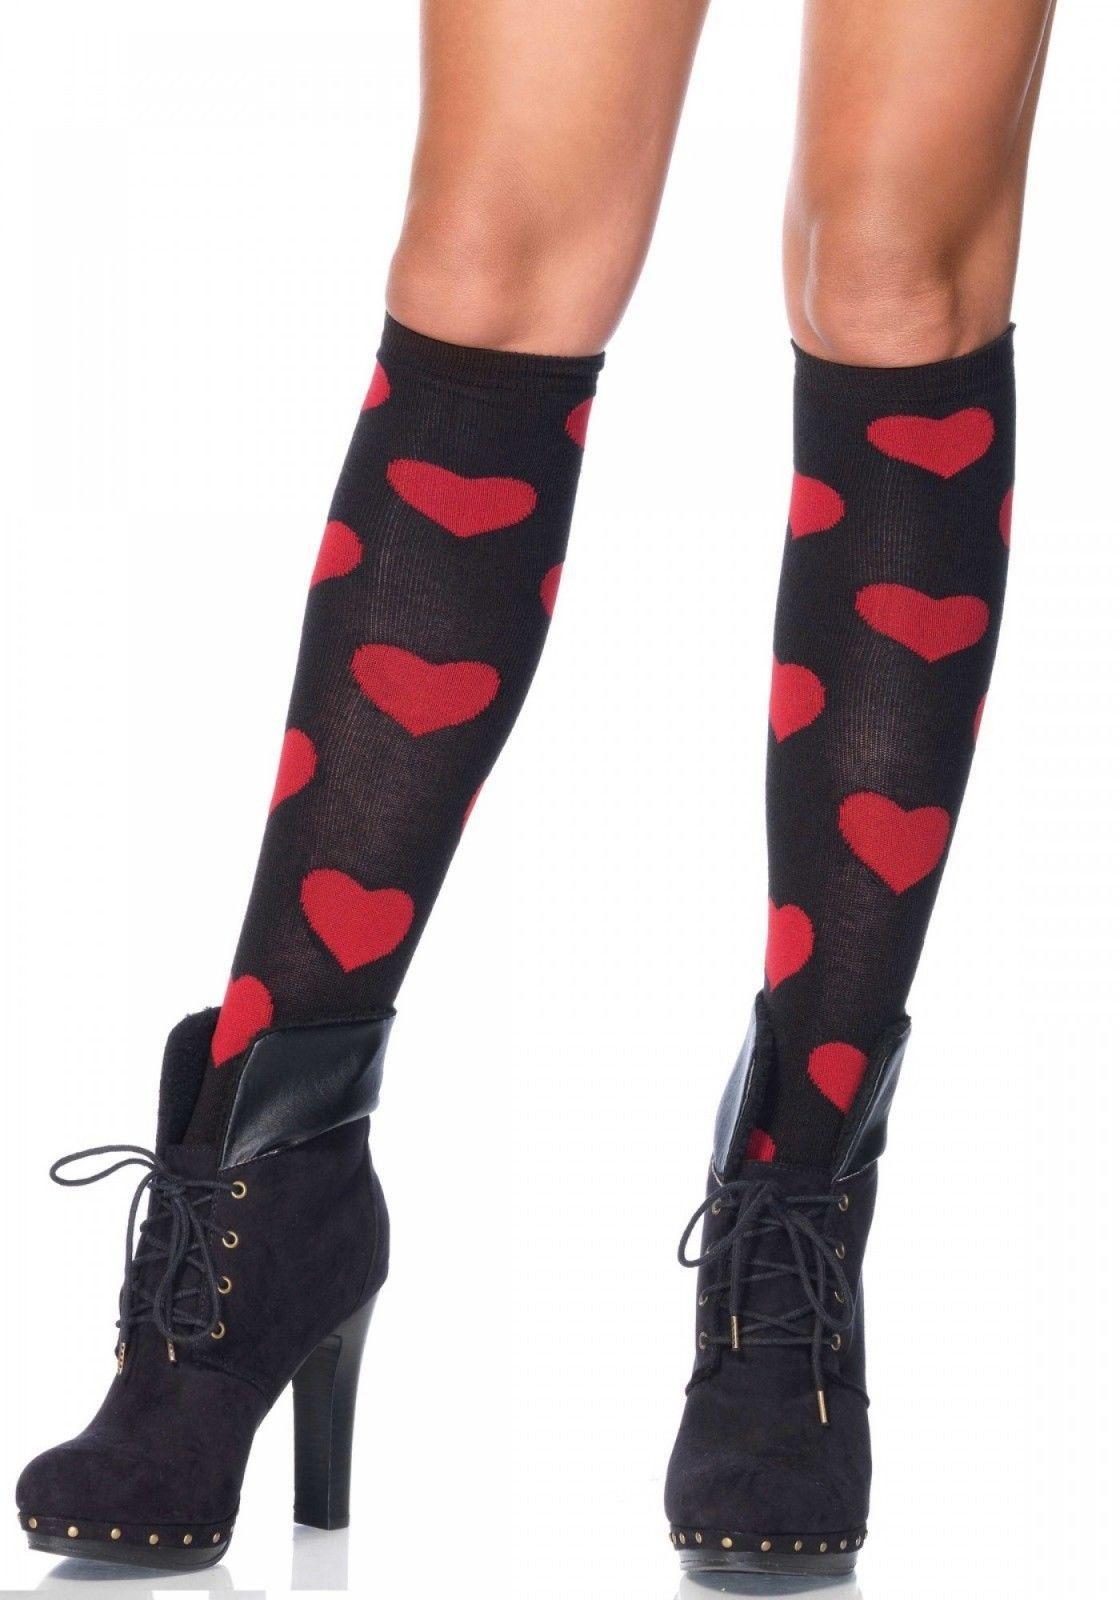 b6f1f6c13f6 Leg Avenue LOVE SICK HEART knee highs black and 50 similar items